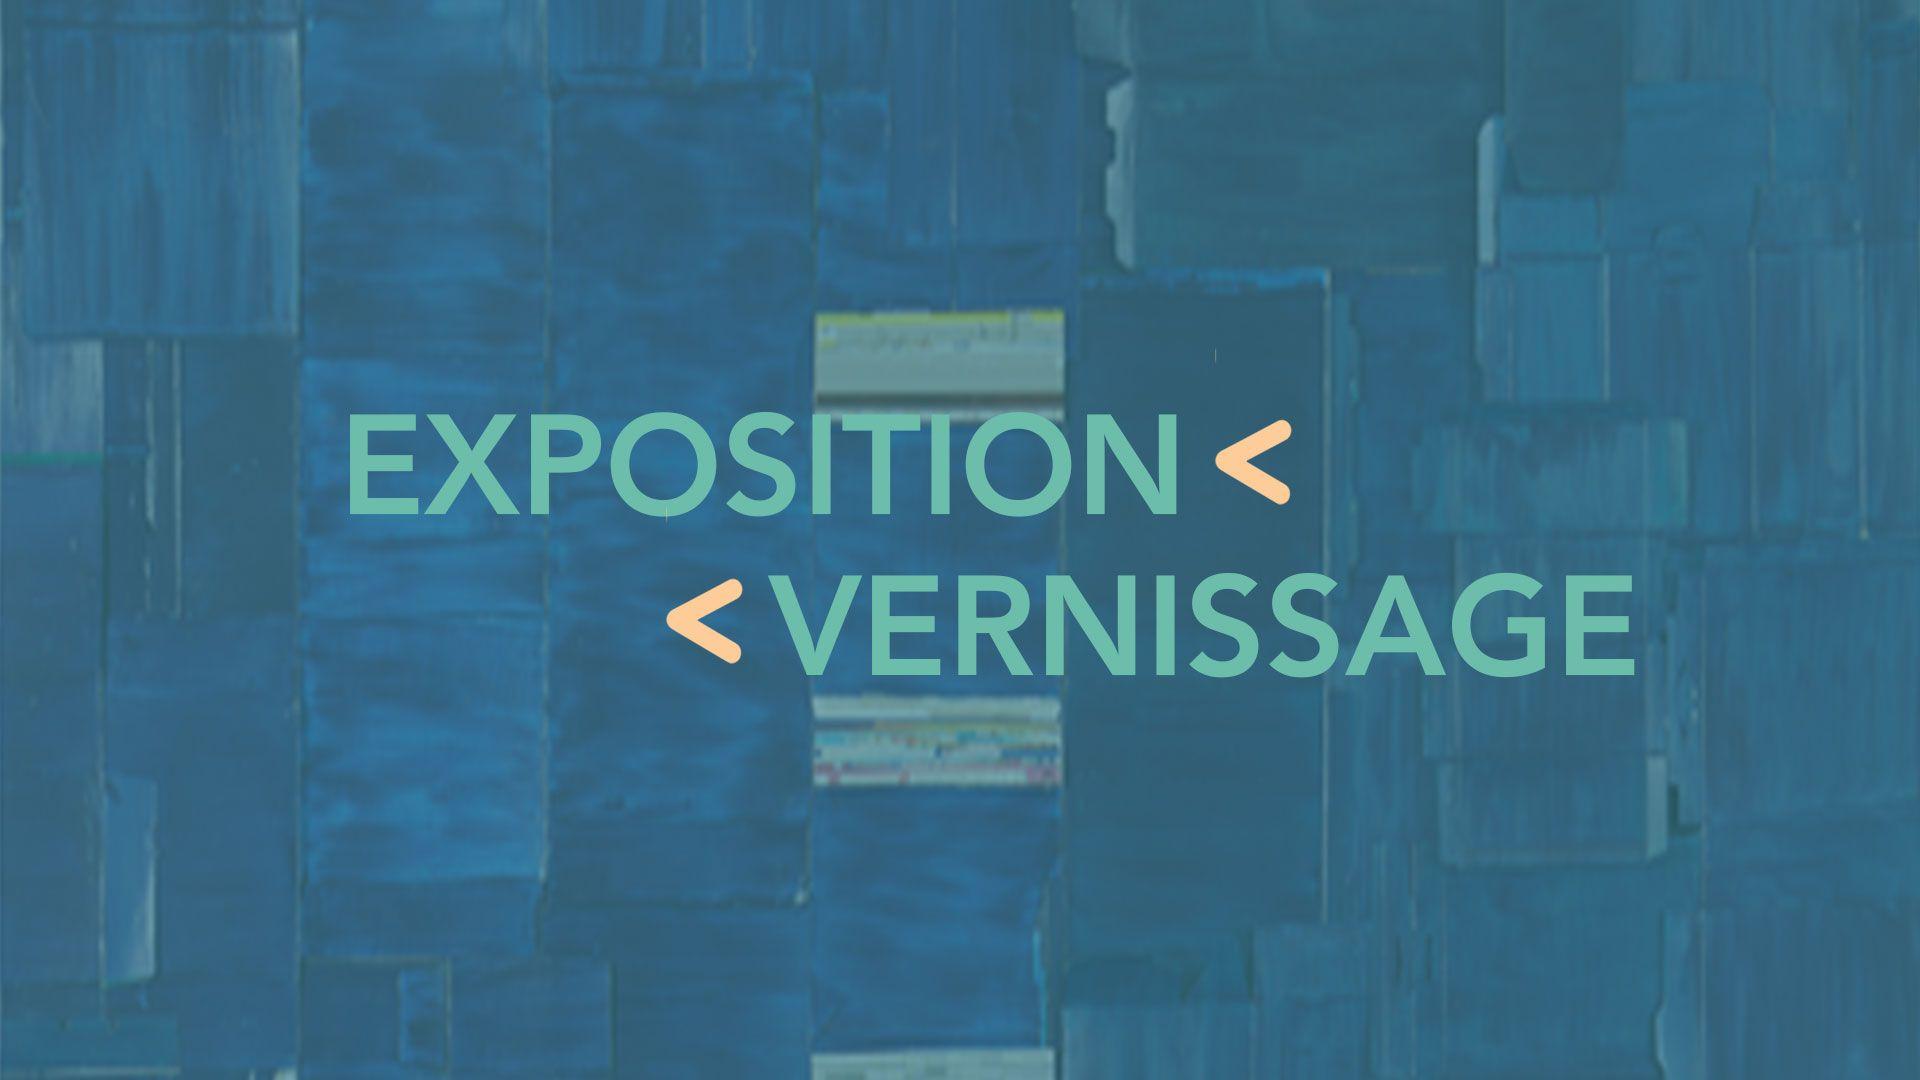 Exposition-vernissage.jpg